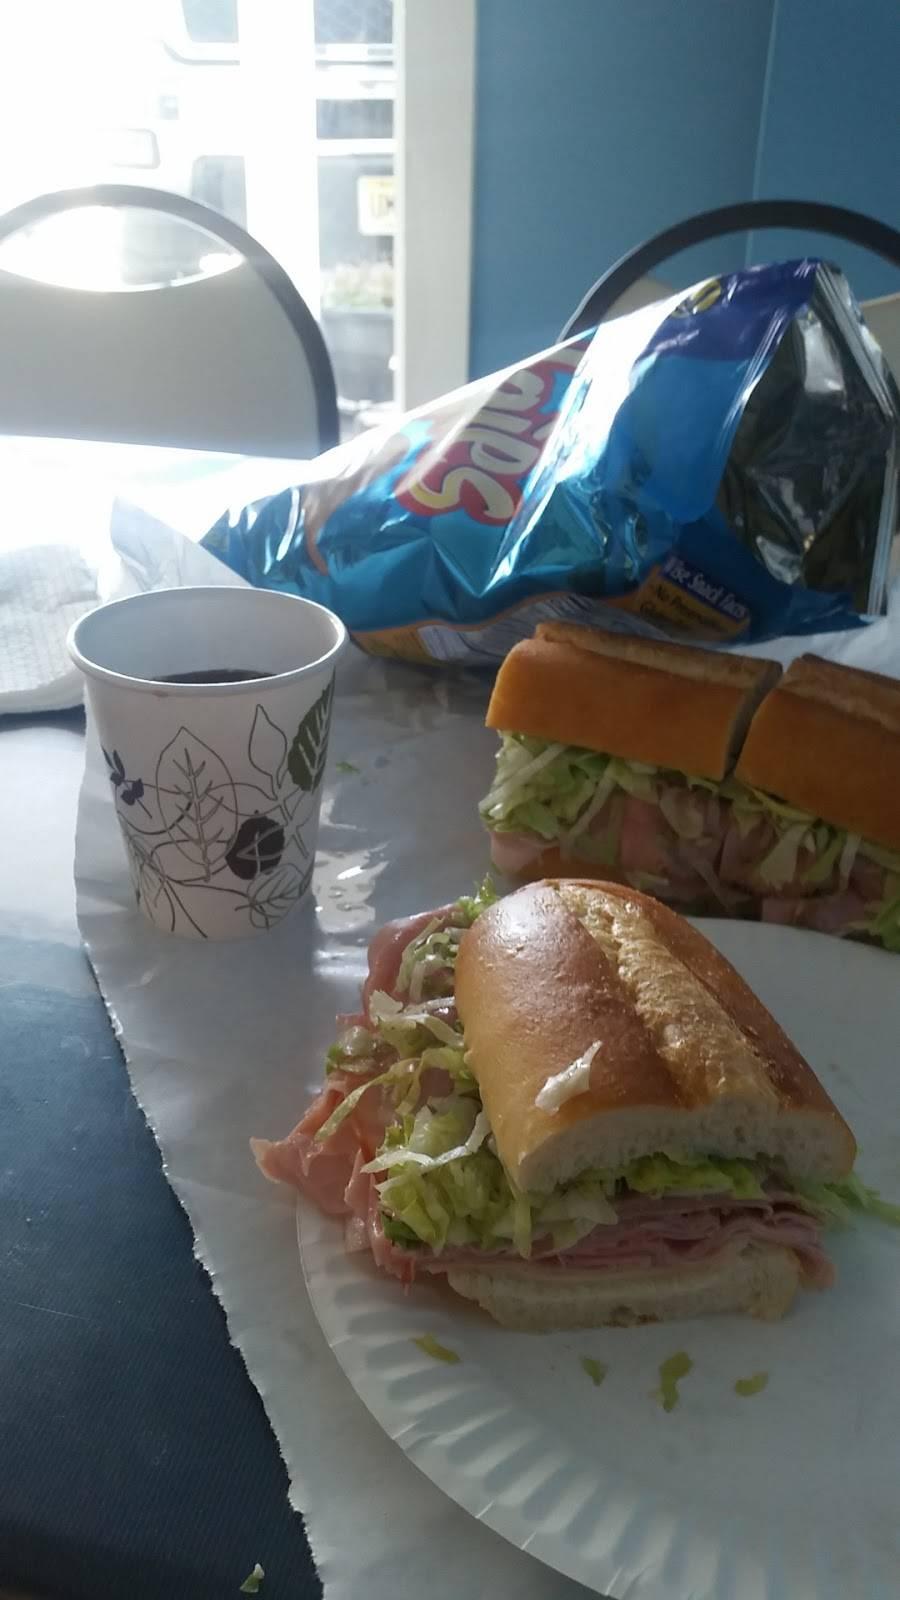 Peteys U.S. SUBS-Peteys Place | meal takeaway | 642 NJ-88, Point Pleasant, NJ 08742, USA | 7328928970 OR +1 732-892-8970